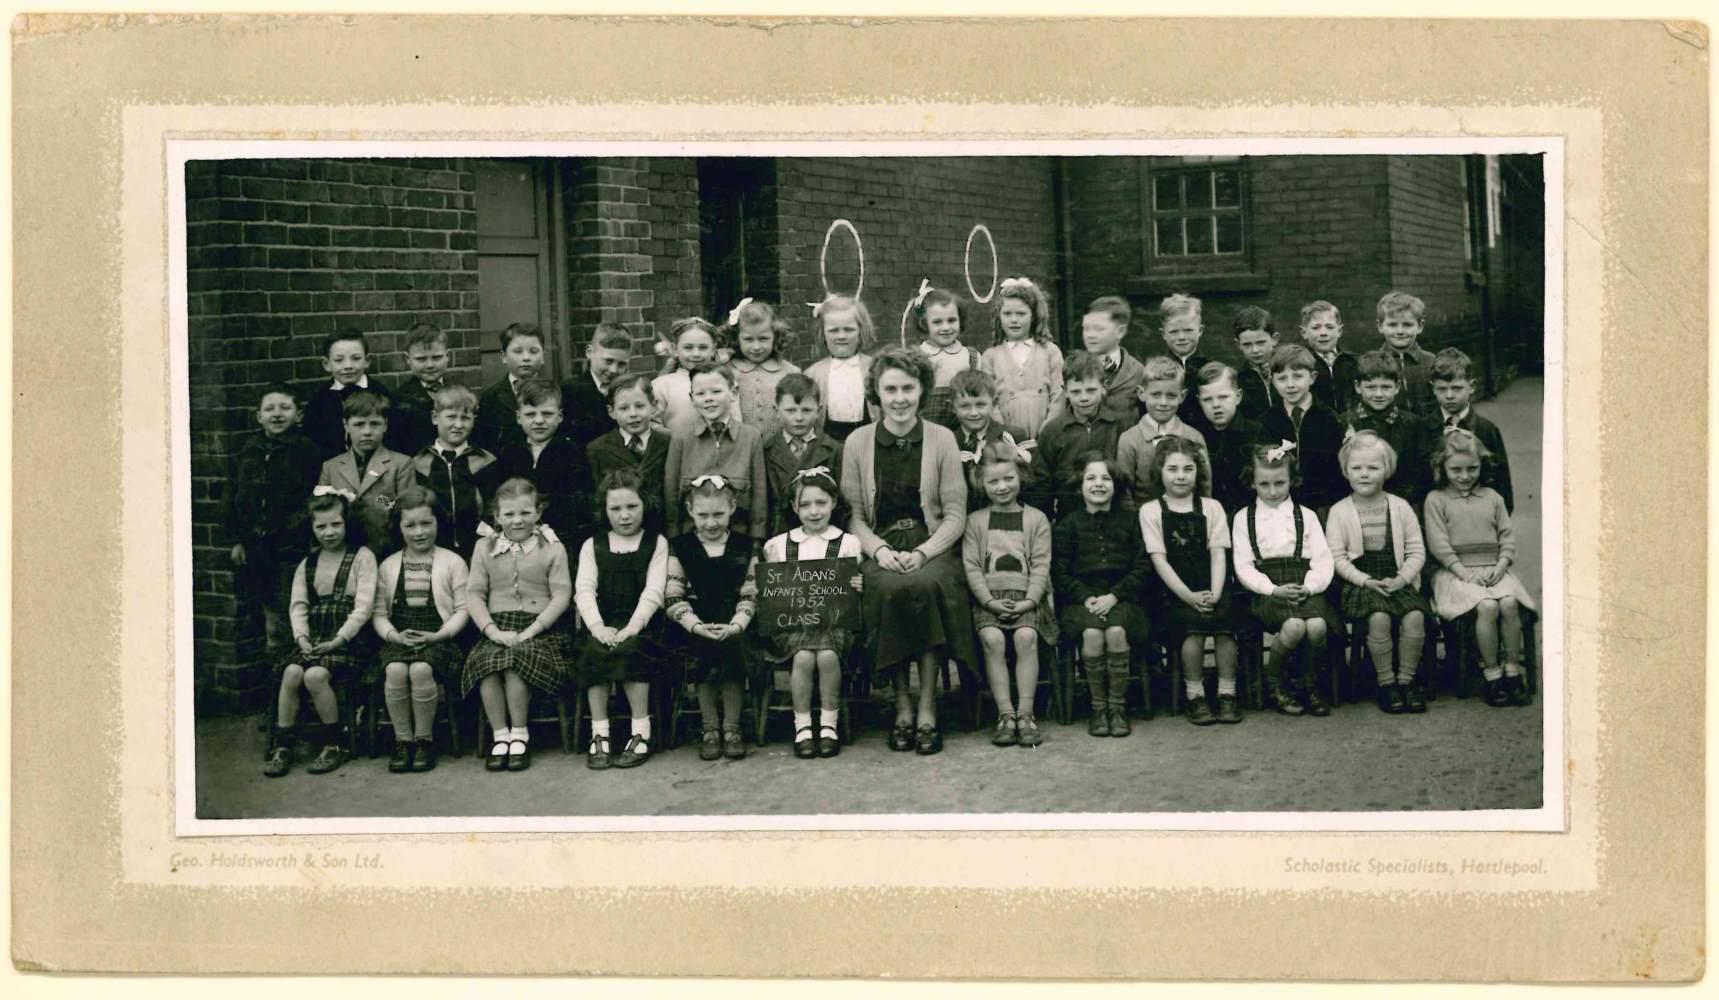 St Aidans CE Primary School - The 1950s